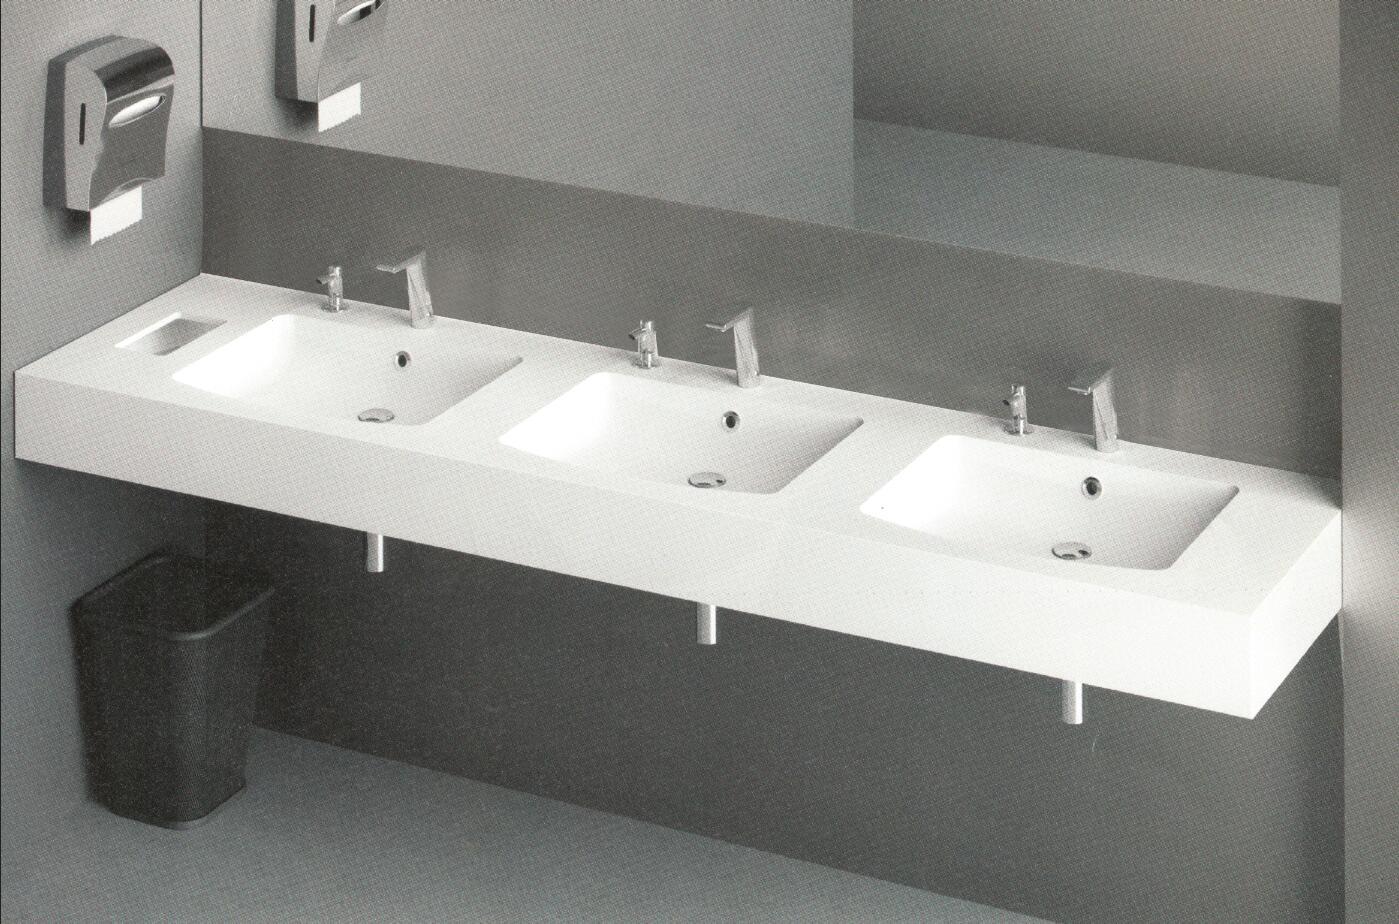 hand wash vanity top public bathroom easy install net triple sinks buy hand wash vanity top public bathroom easy install net triple sinks product on